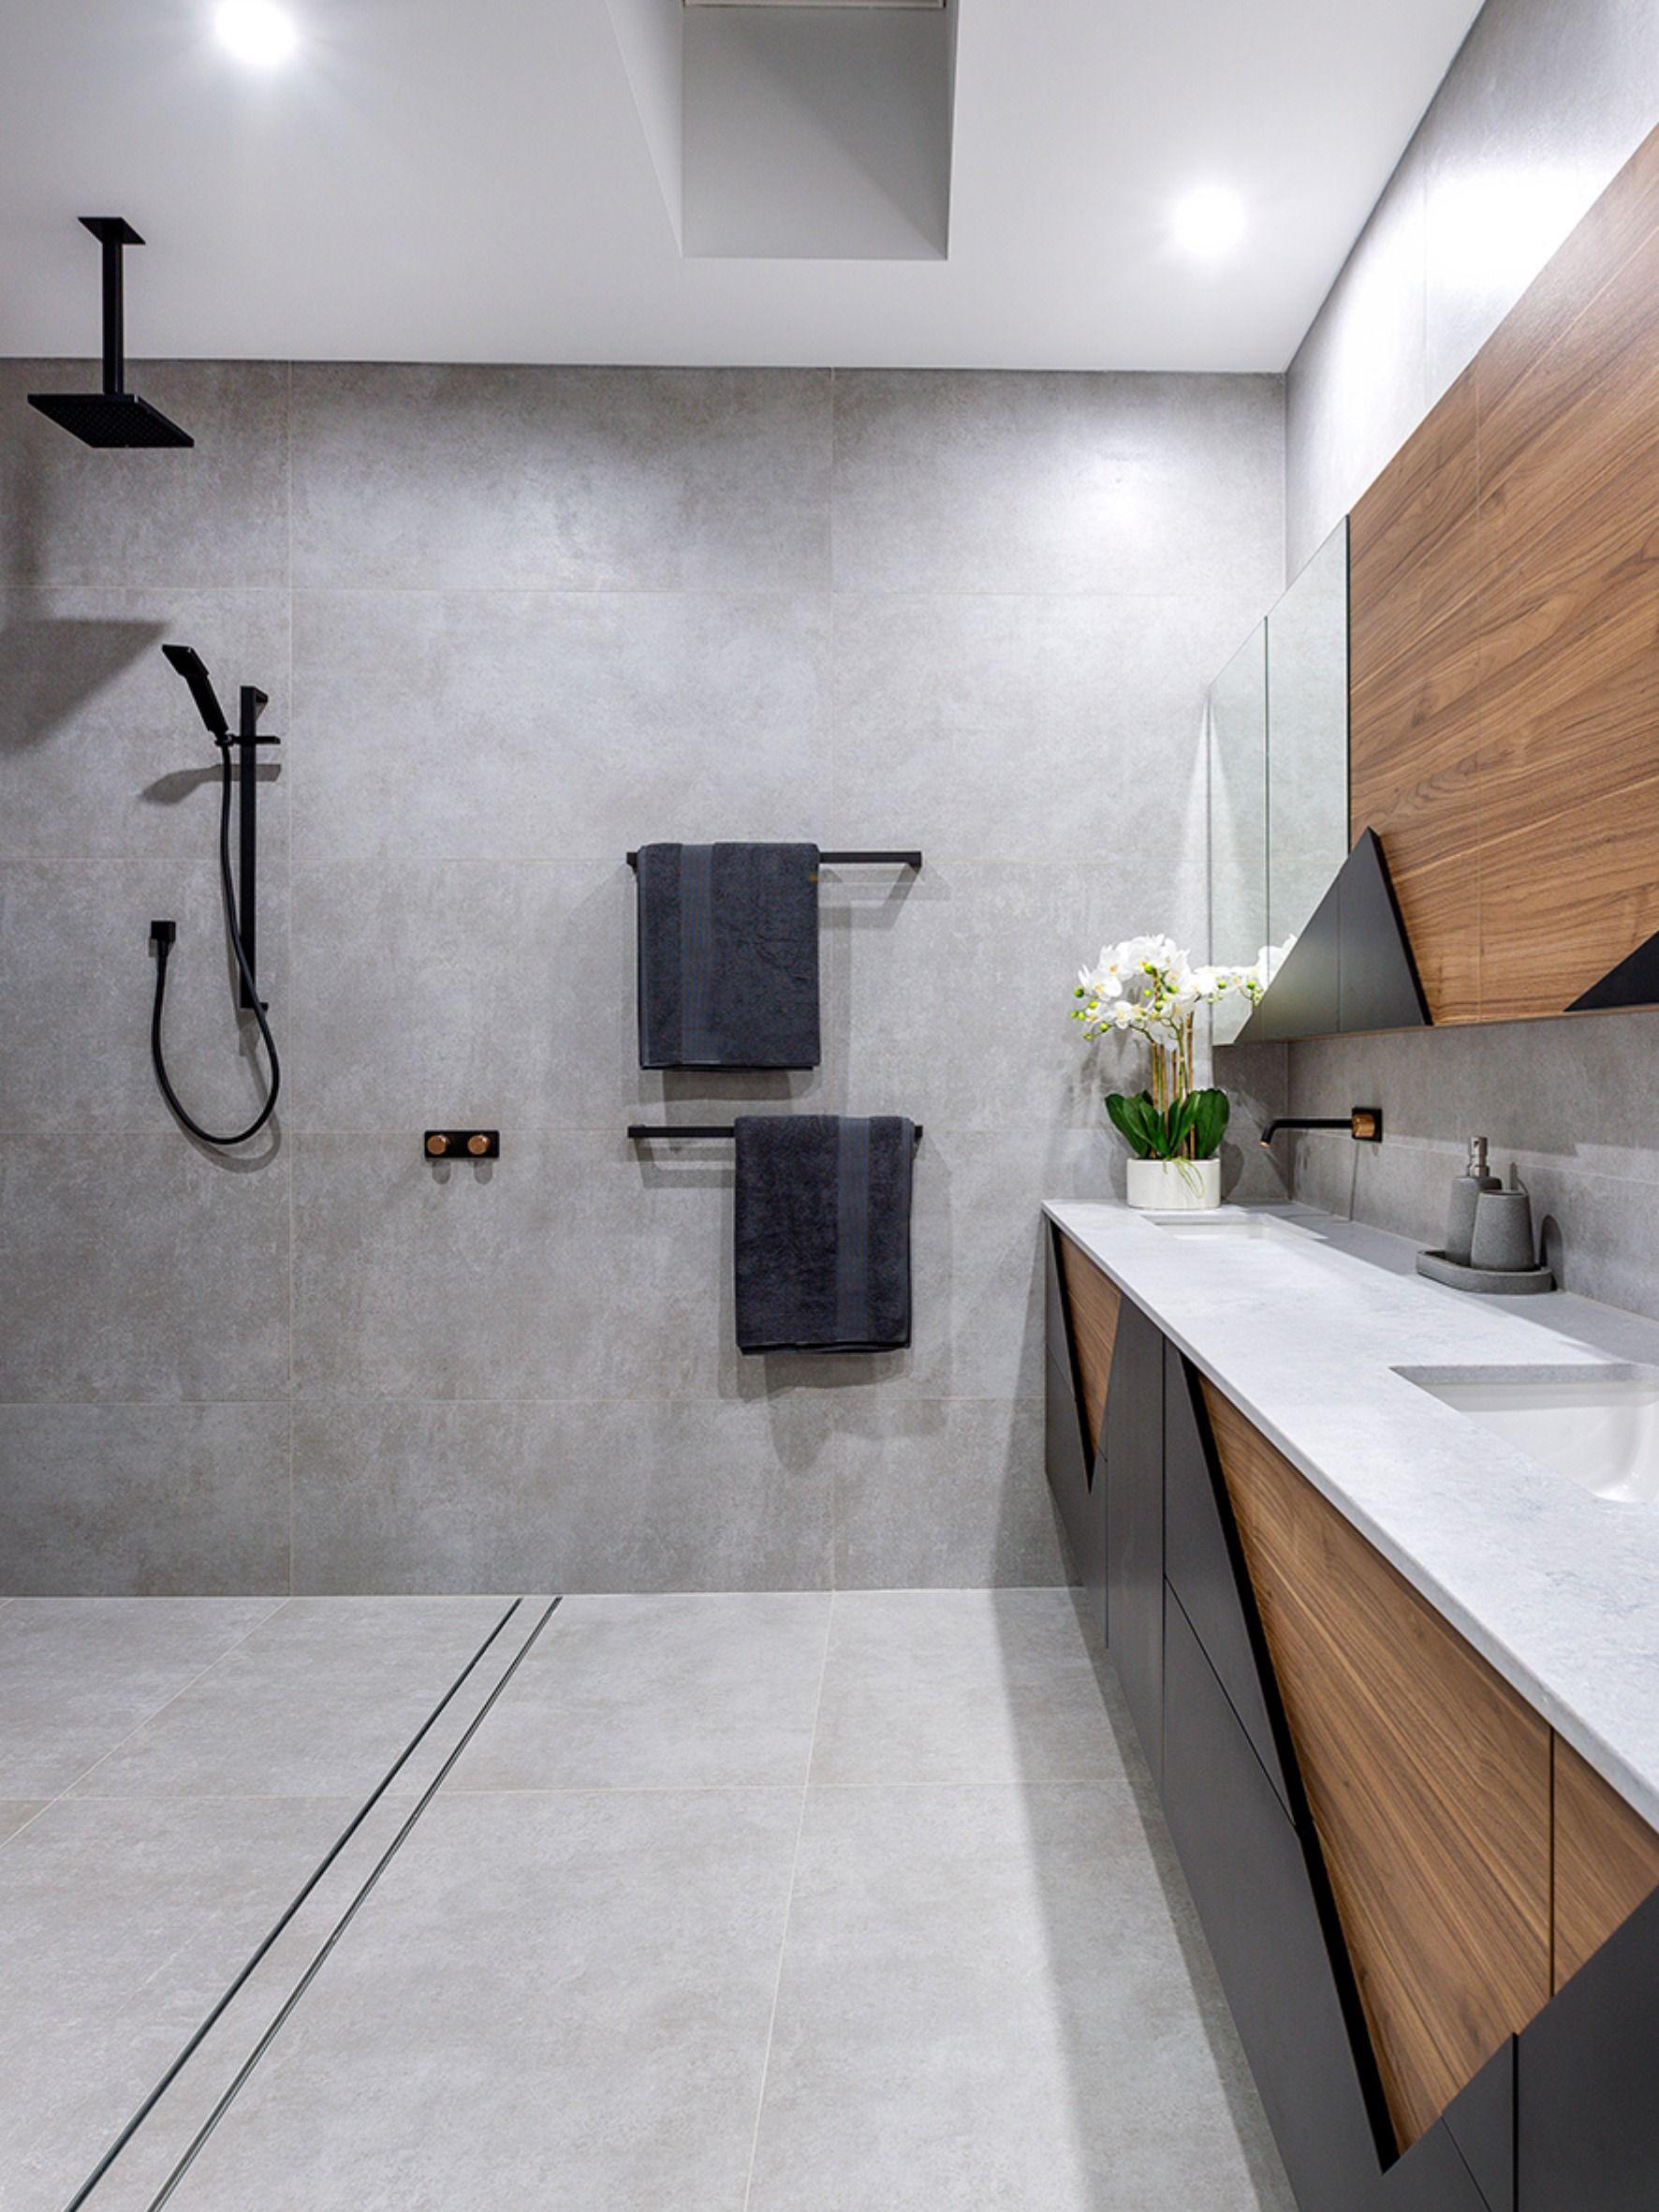 Bespoke Bathroom Design For A Luxury Home Minimalist Bathroom Design Bathroom Design Minimalist Bathroom Minimalist luxury small bathroom